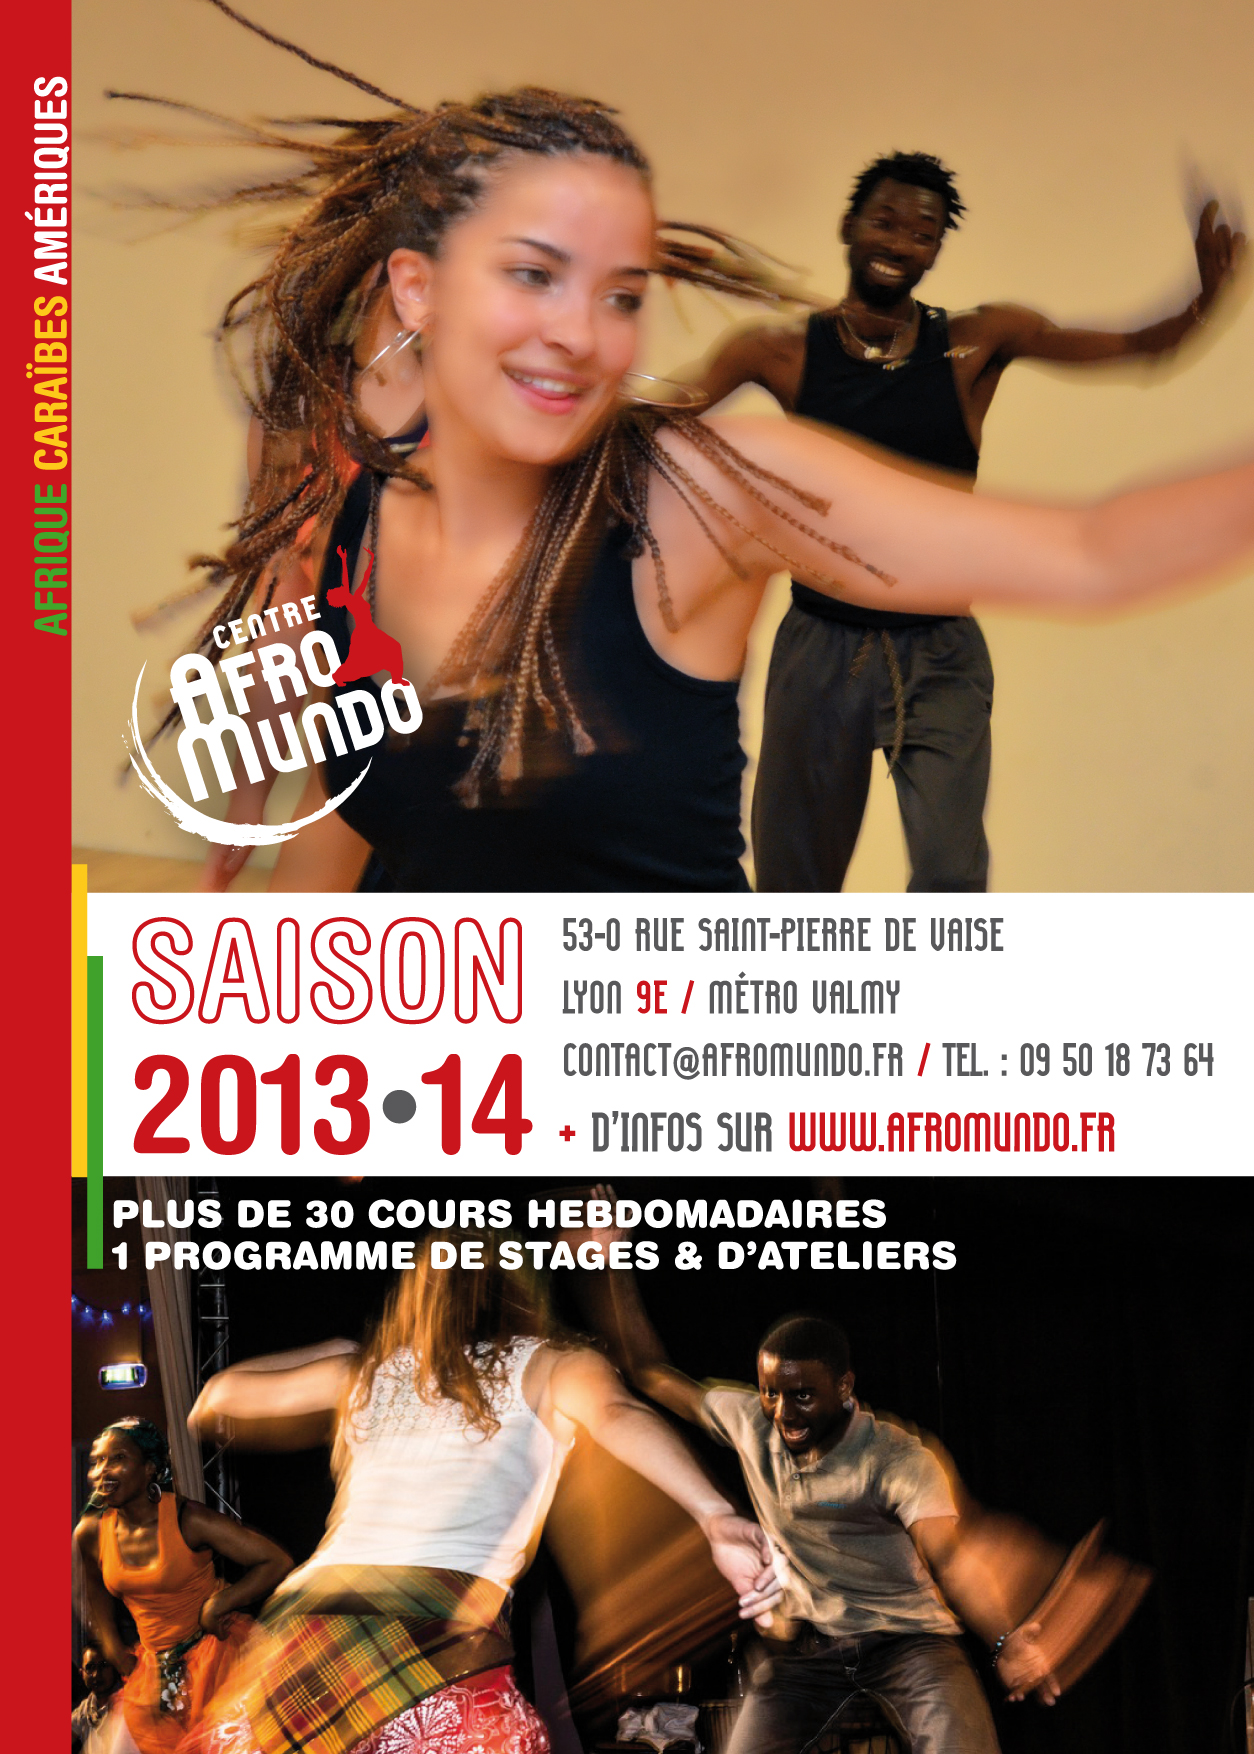 http://afromundo.fr/wp-content/uploads/2013/06/Couverture-Prog-13-14-02.jpg